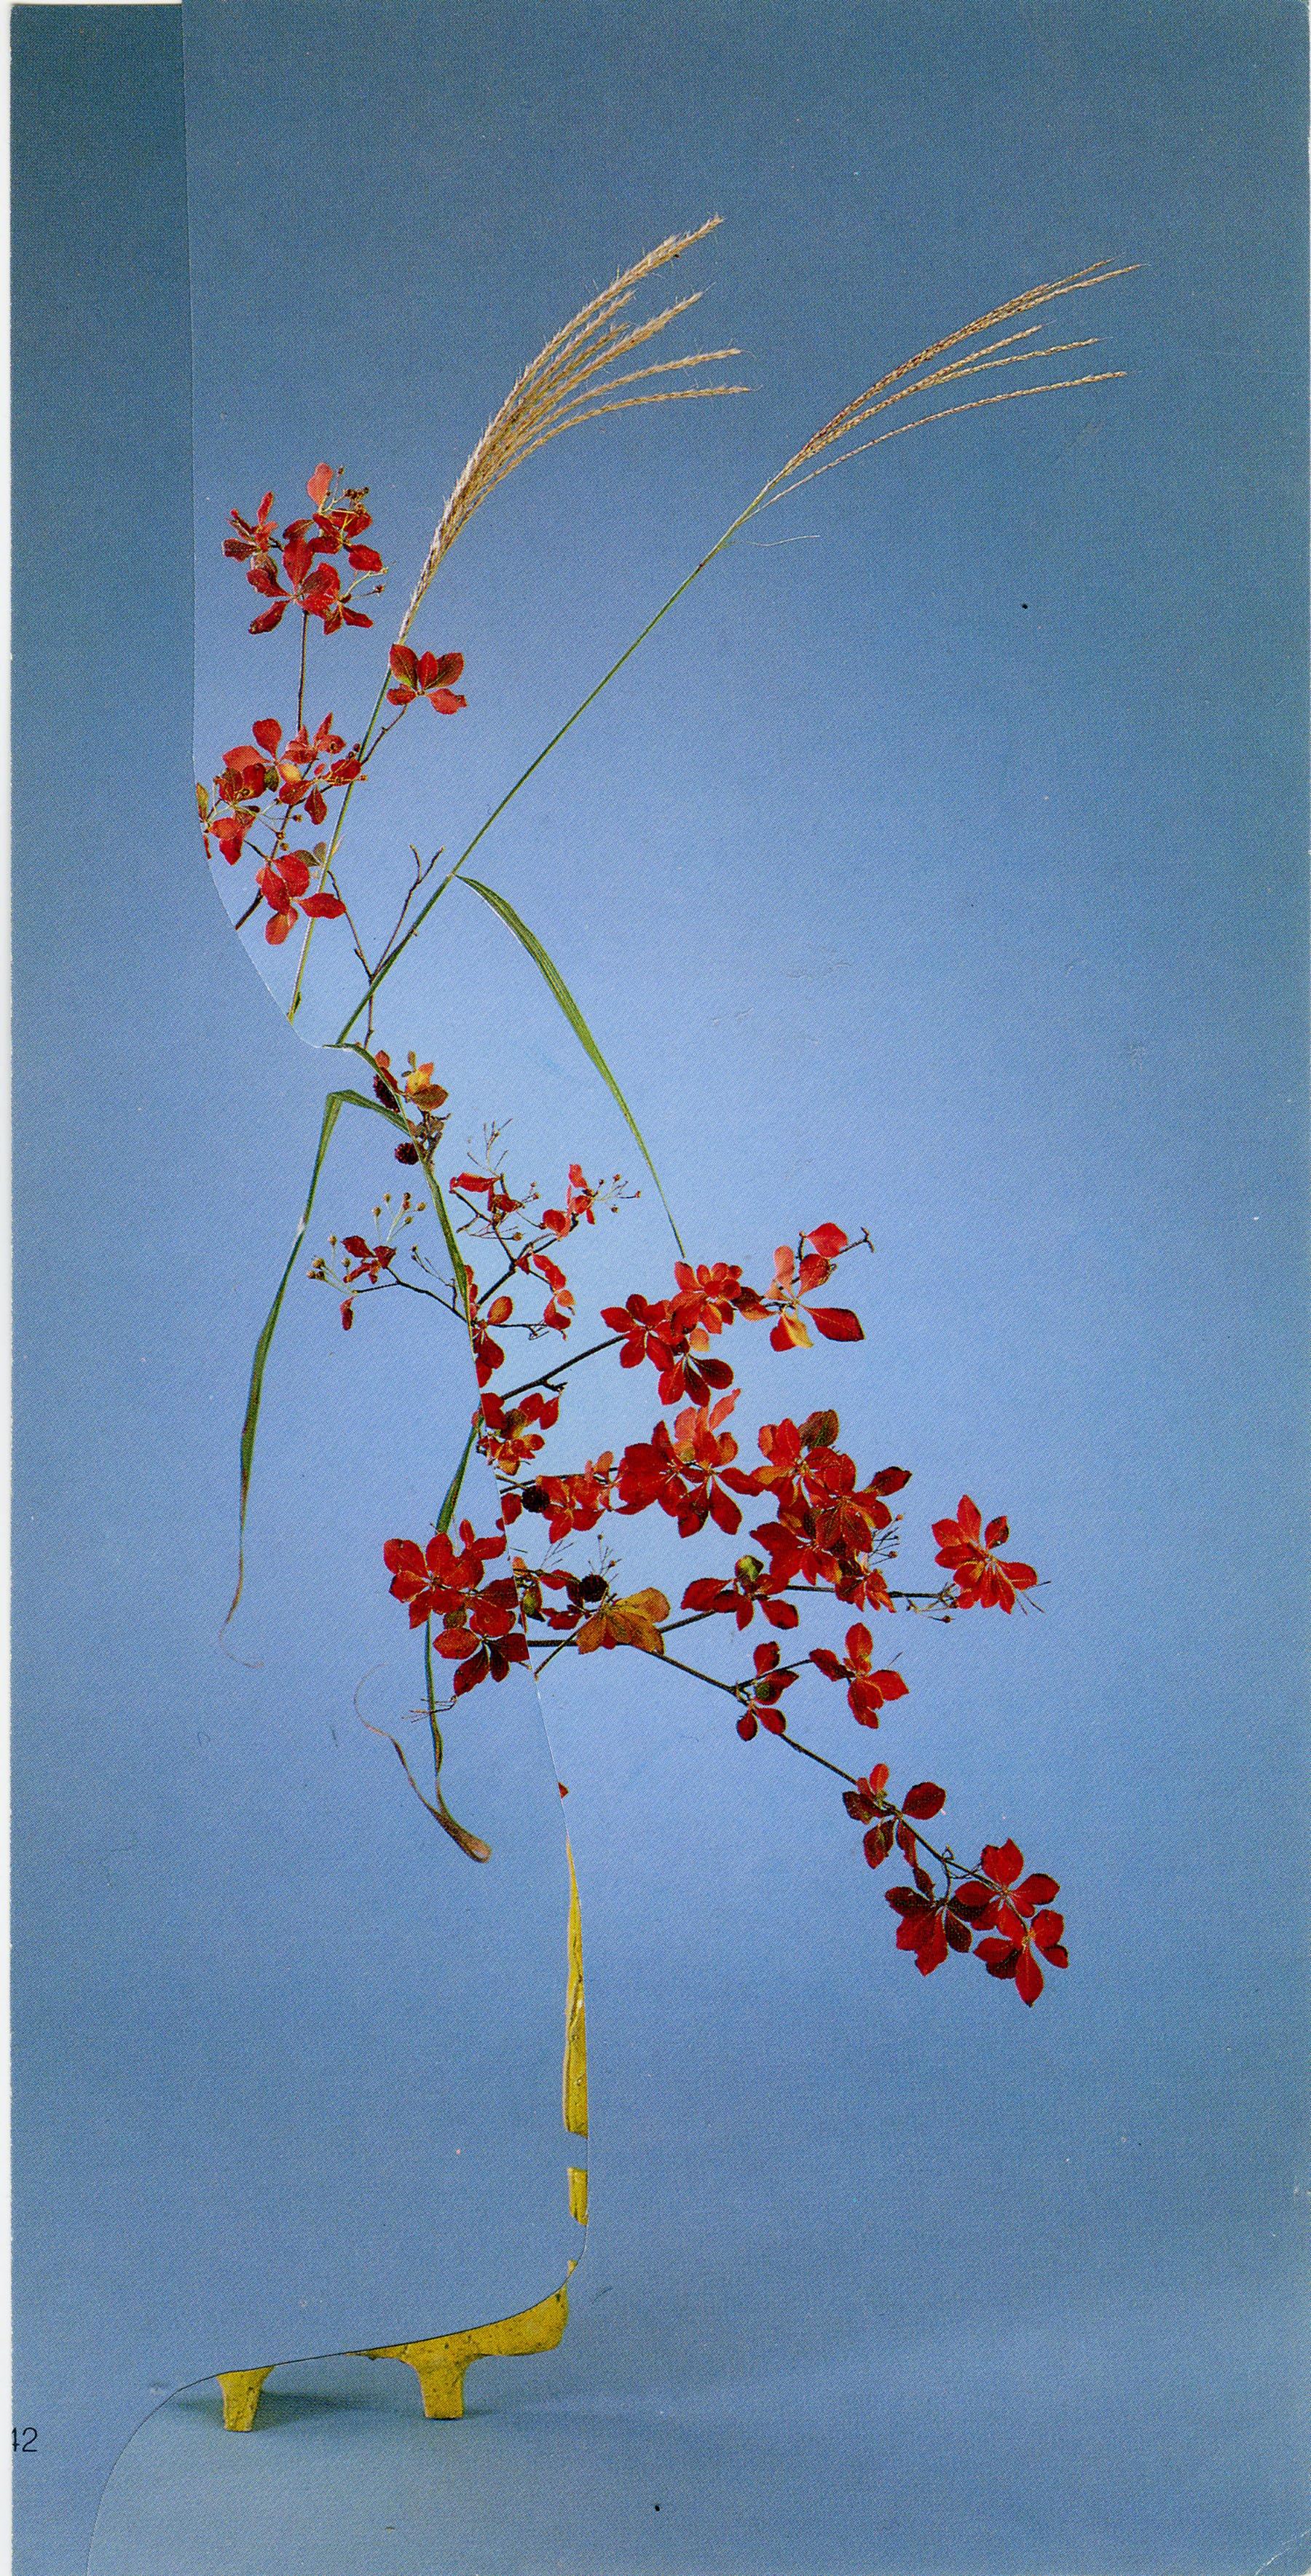 iGNANT-Art-Nicola-Kloosterman-Ikebana-002